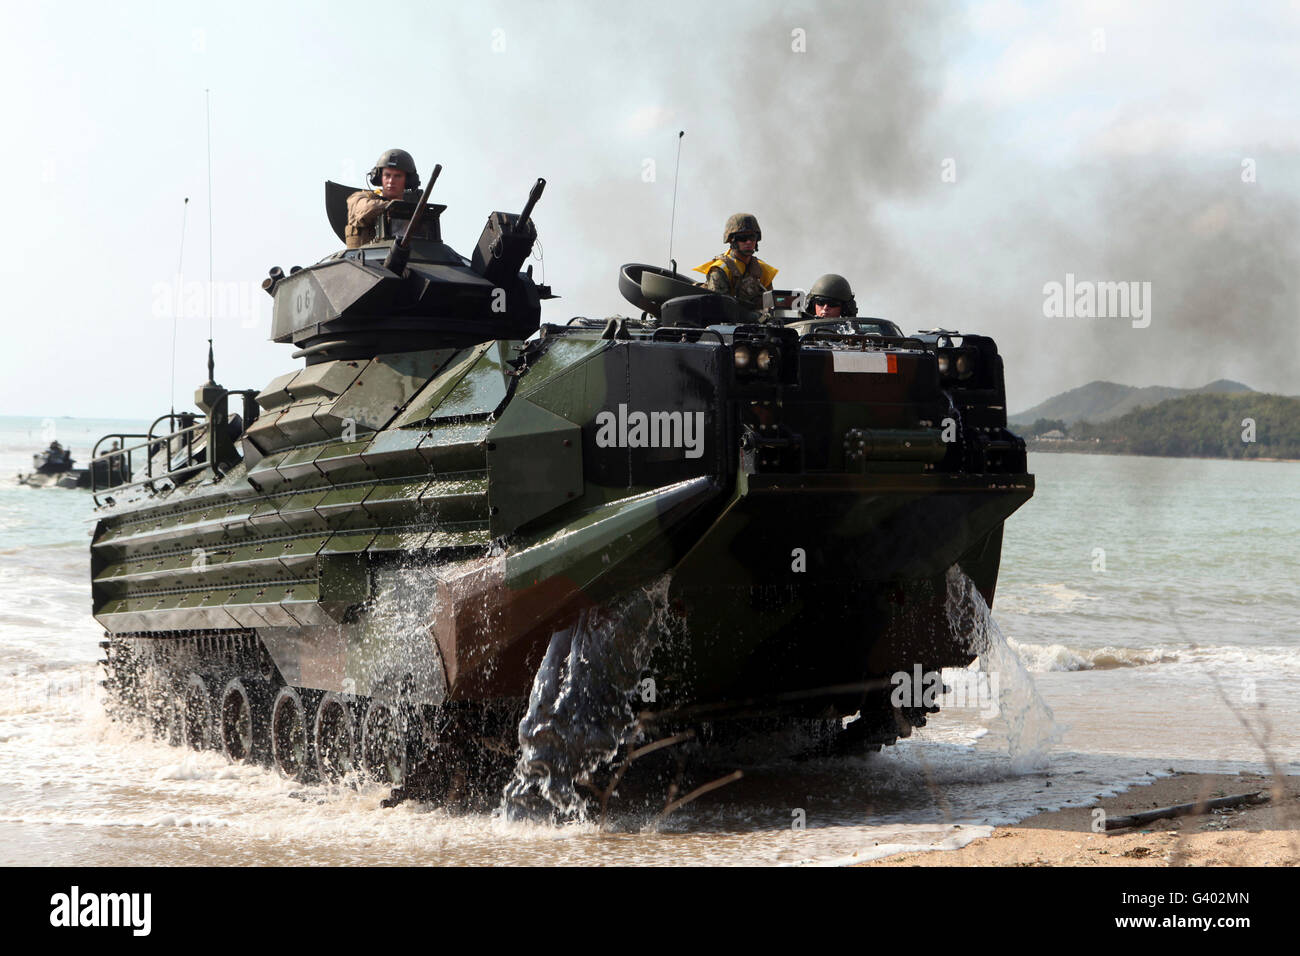 An amphibious assault vehicle hits the beach during a mechanized raid. - Stock Image